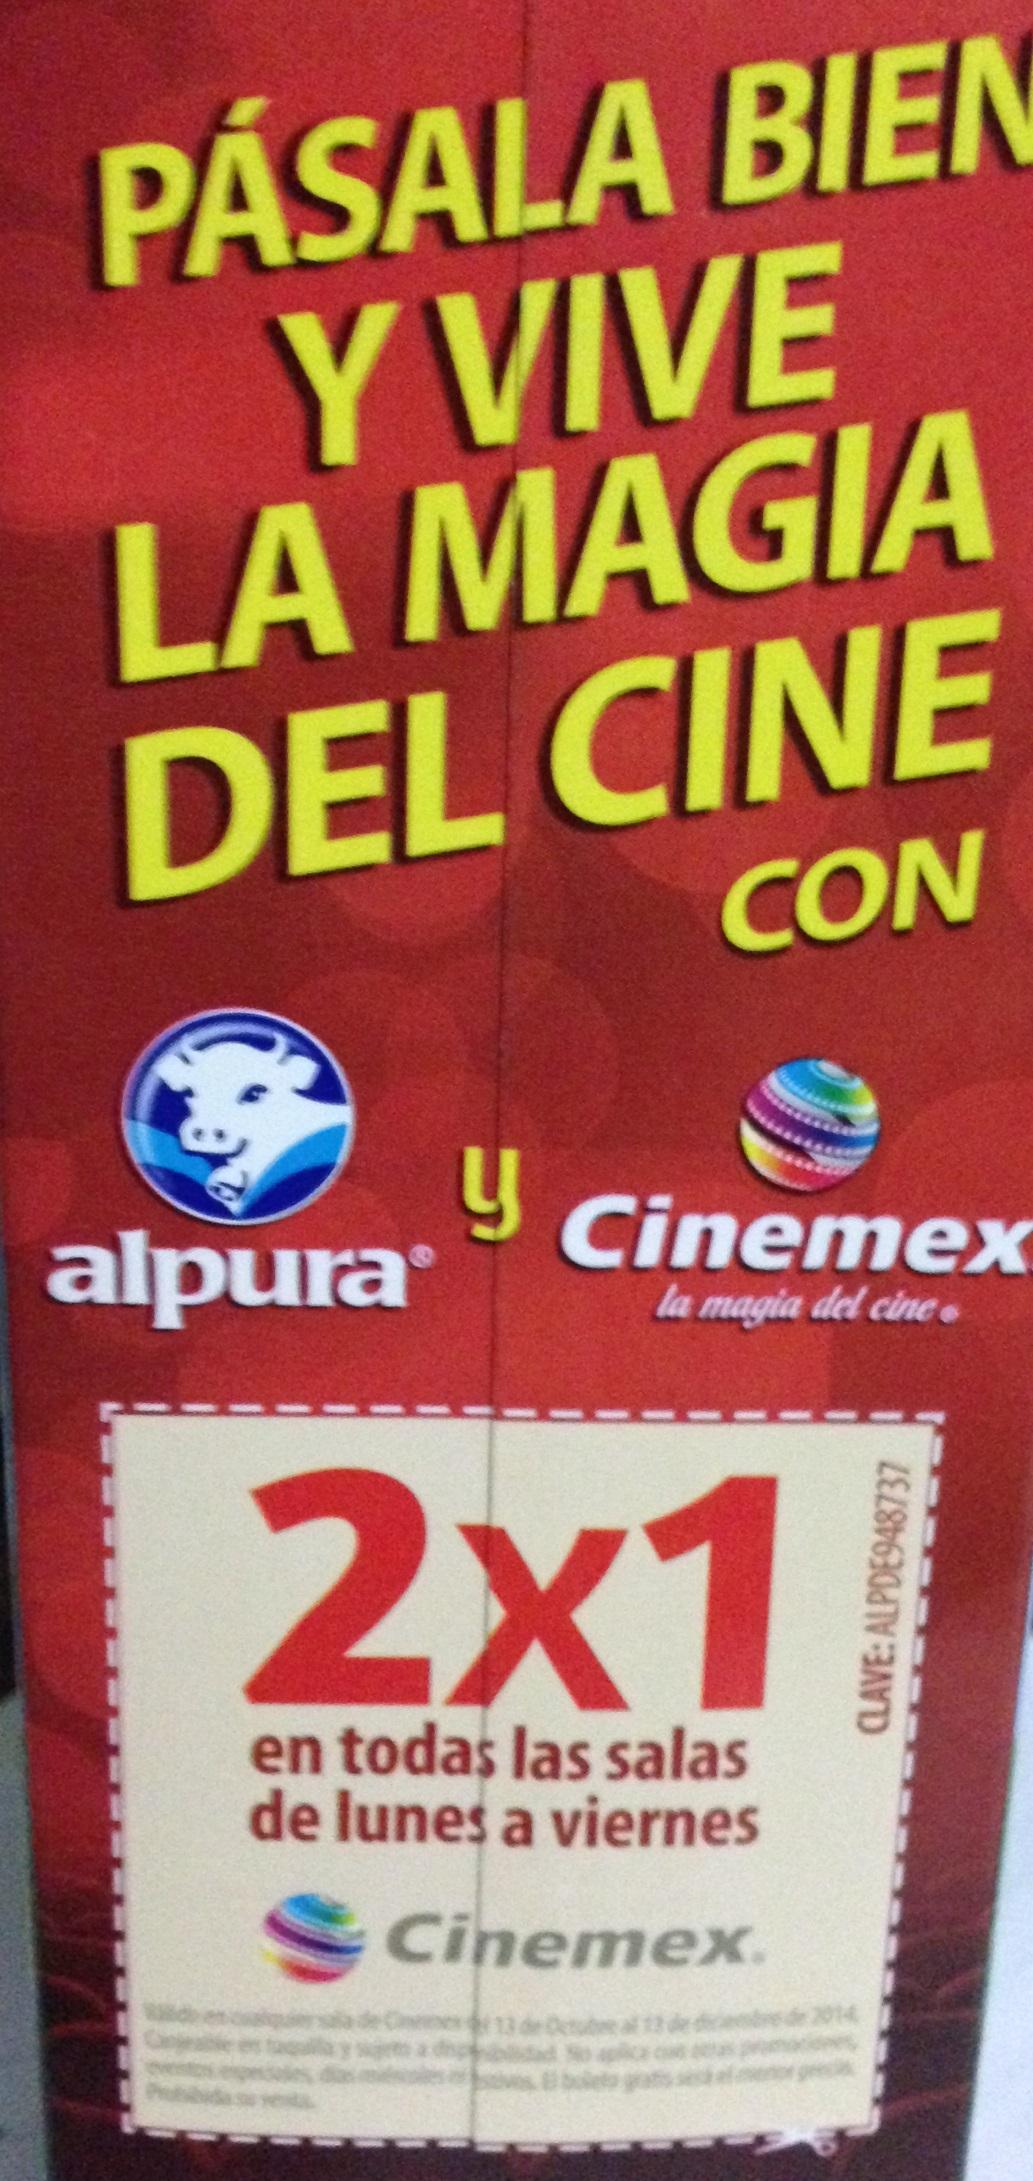 Cinemex: 2x1 lon Leche Alpura